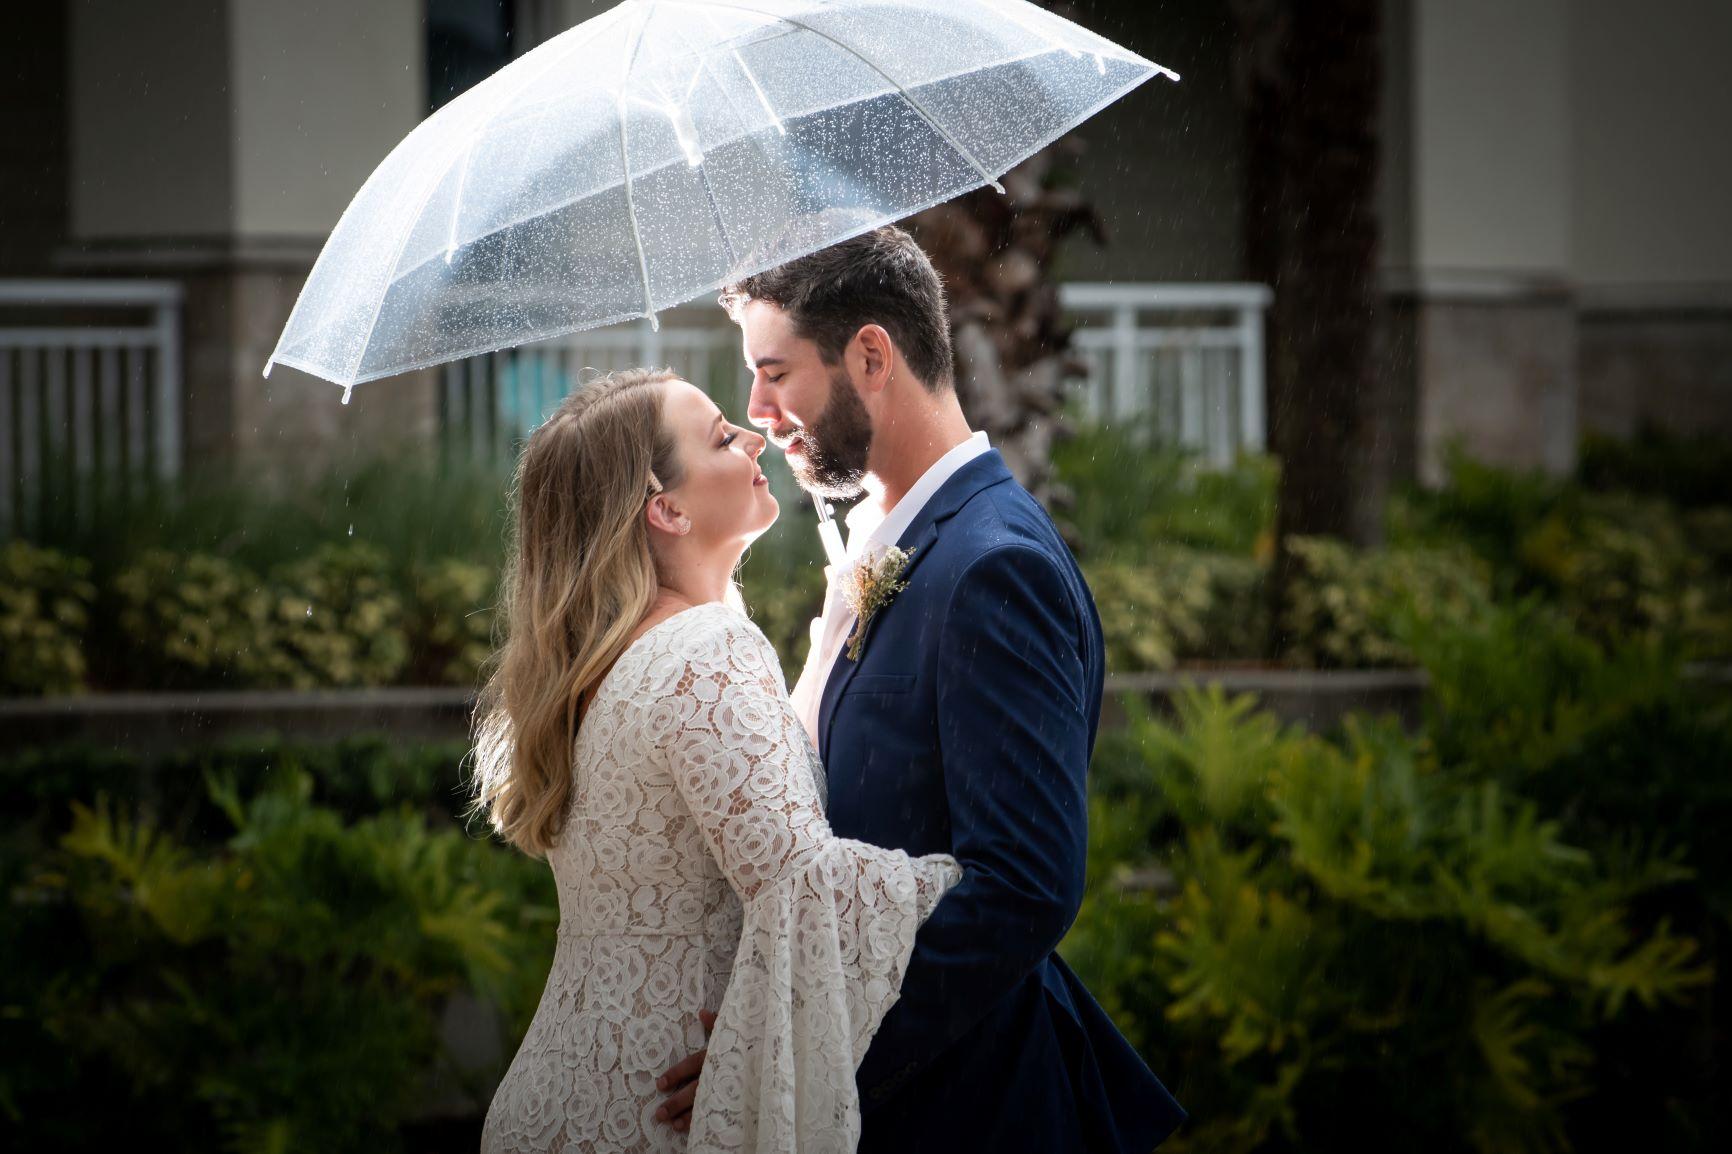 Rainy Day Wedding | Lindsey and Jon at Margaritaville Resort